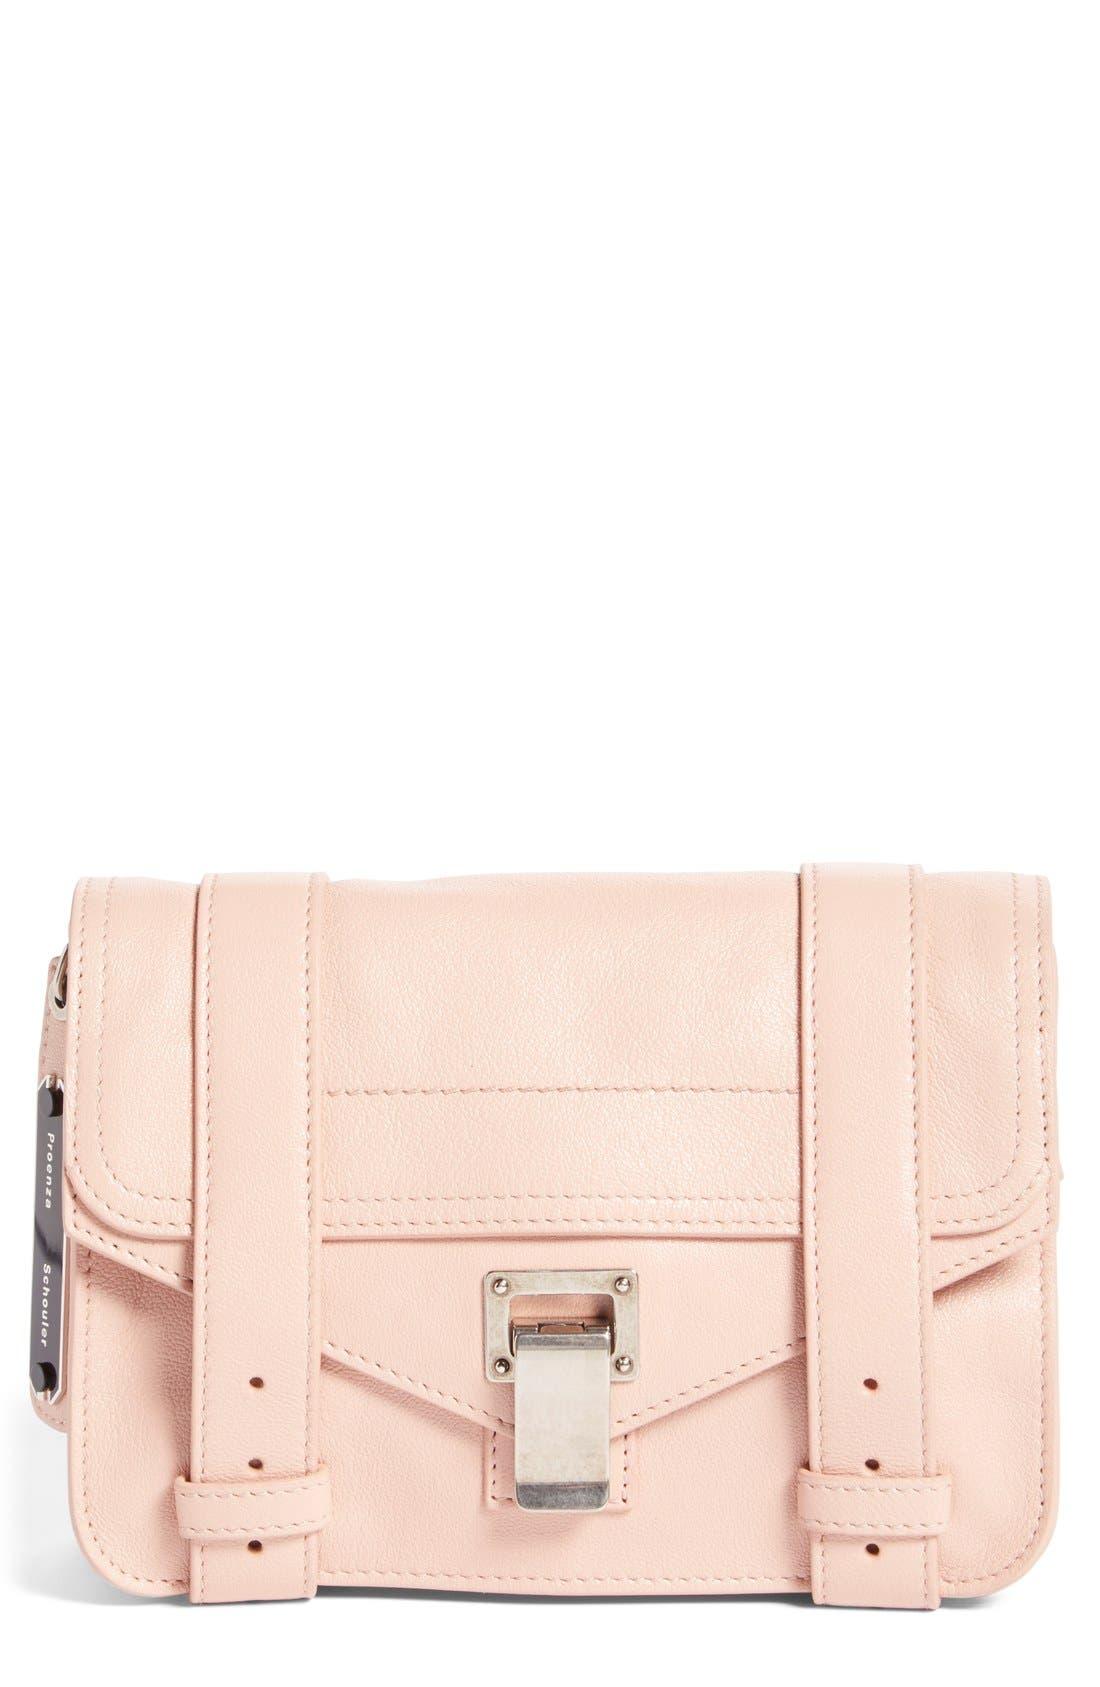 'Mini PS1' Lambskin Leather Crossbody Bag,                             Main thumbnail 1, color,